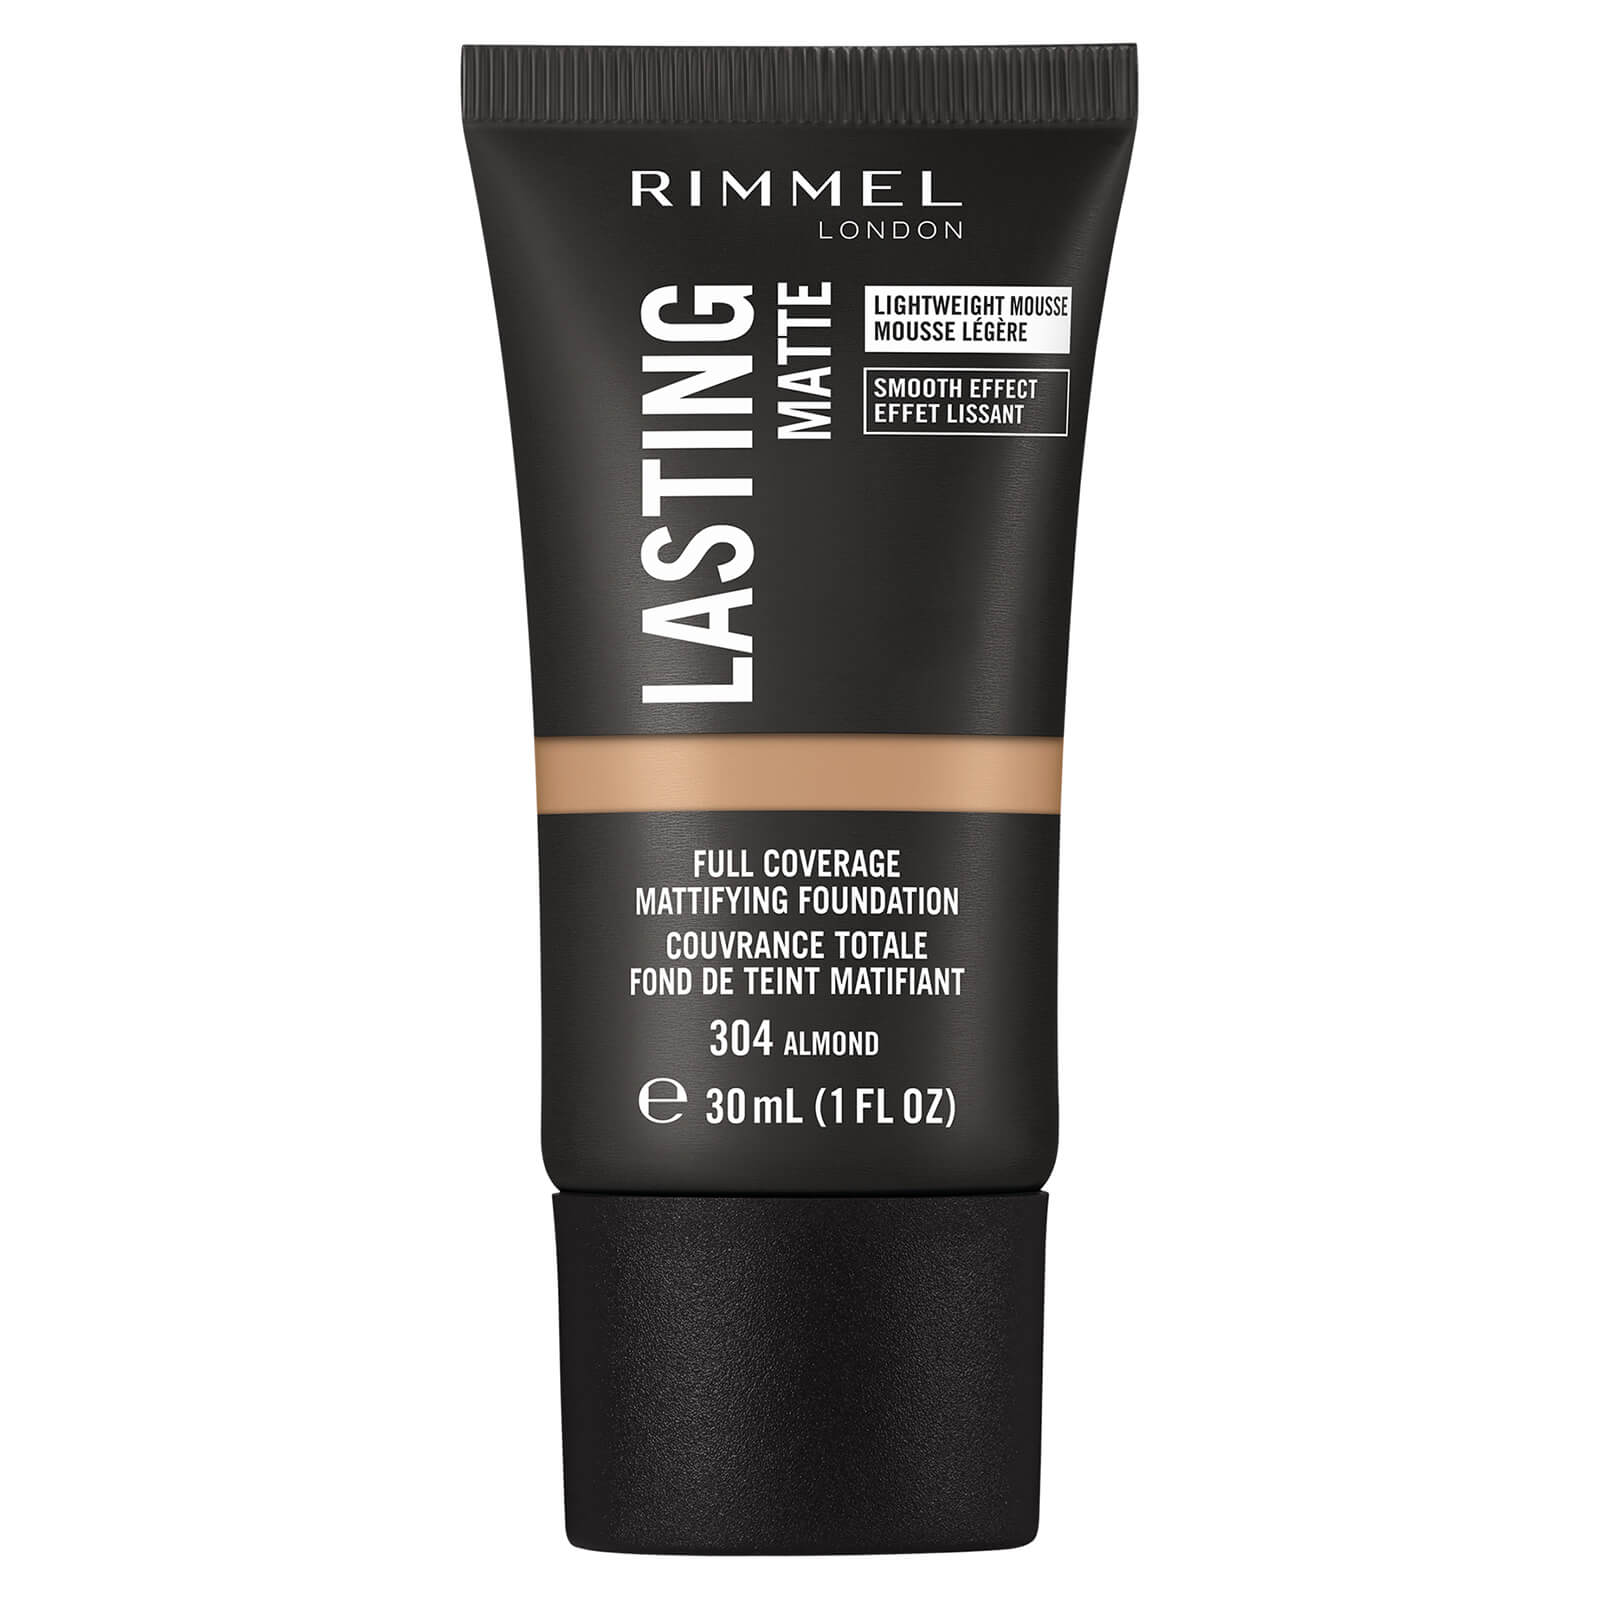 Купить Rimmel London Lasting Matte Foundation 30ml (Various Shades) - 304 Almond